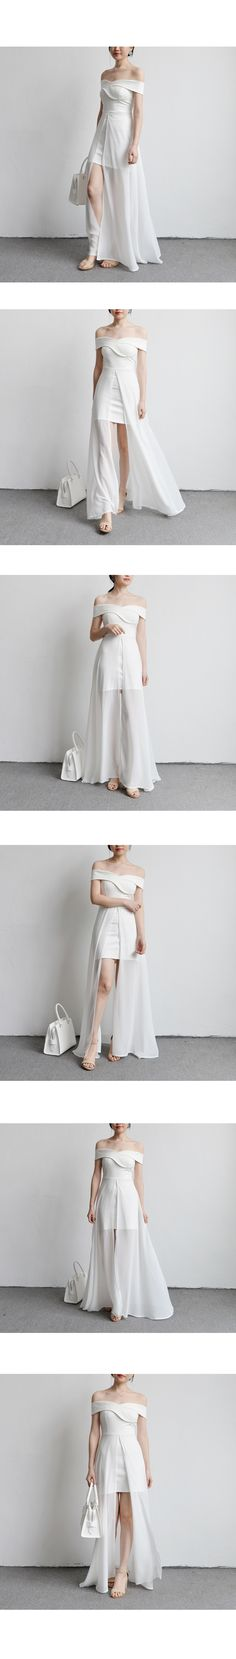 TANSSHOP东南亚弧形一字领露肩网纱开叉长裙修身连衣裙礼服裙D149-淘宝网